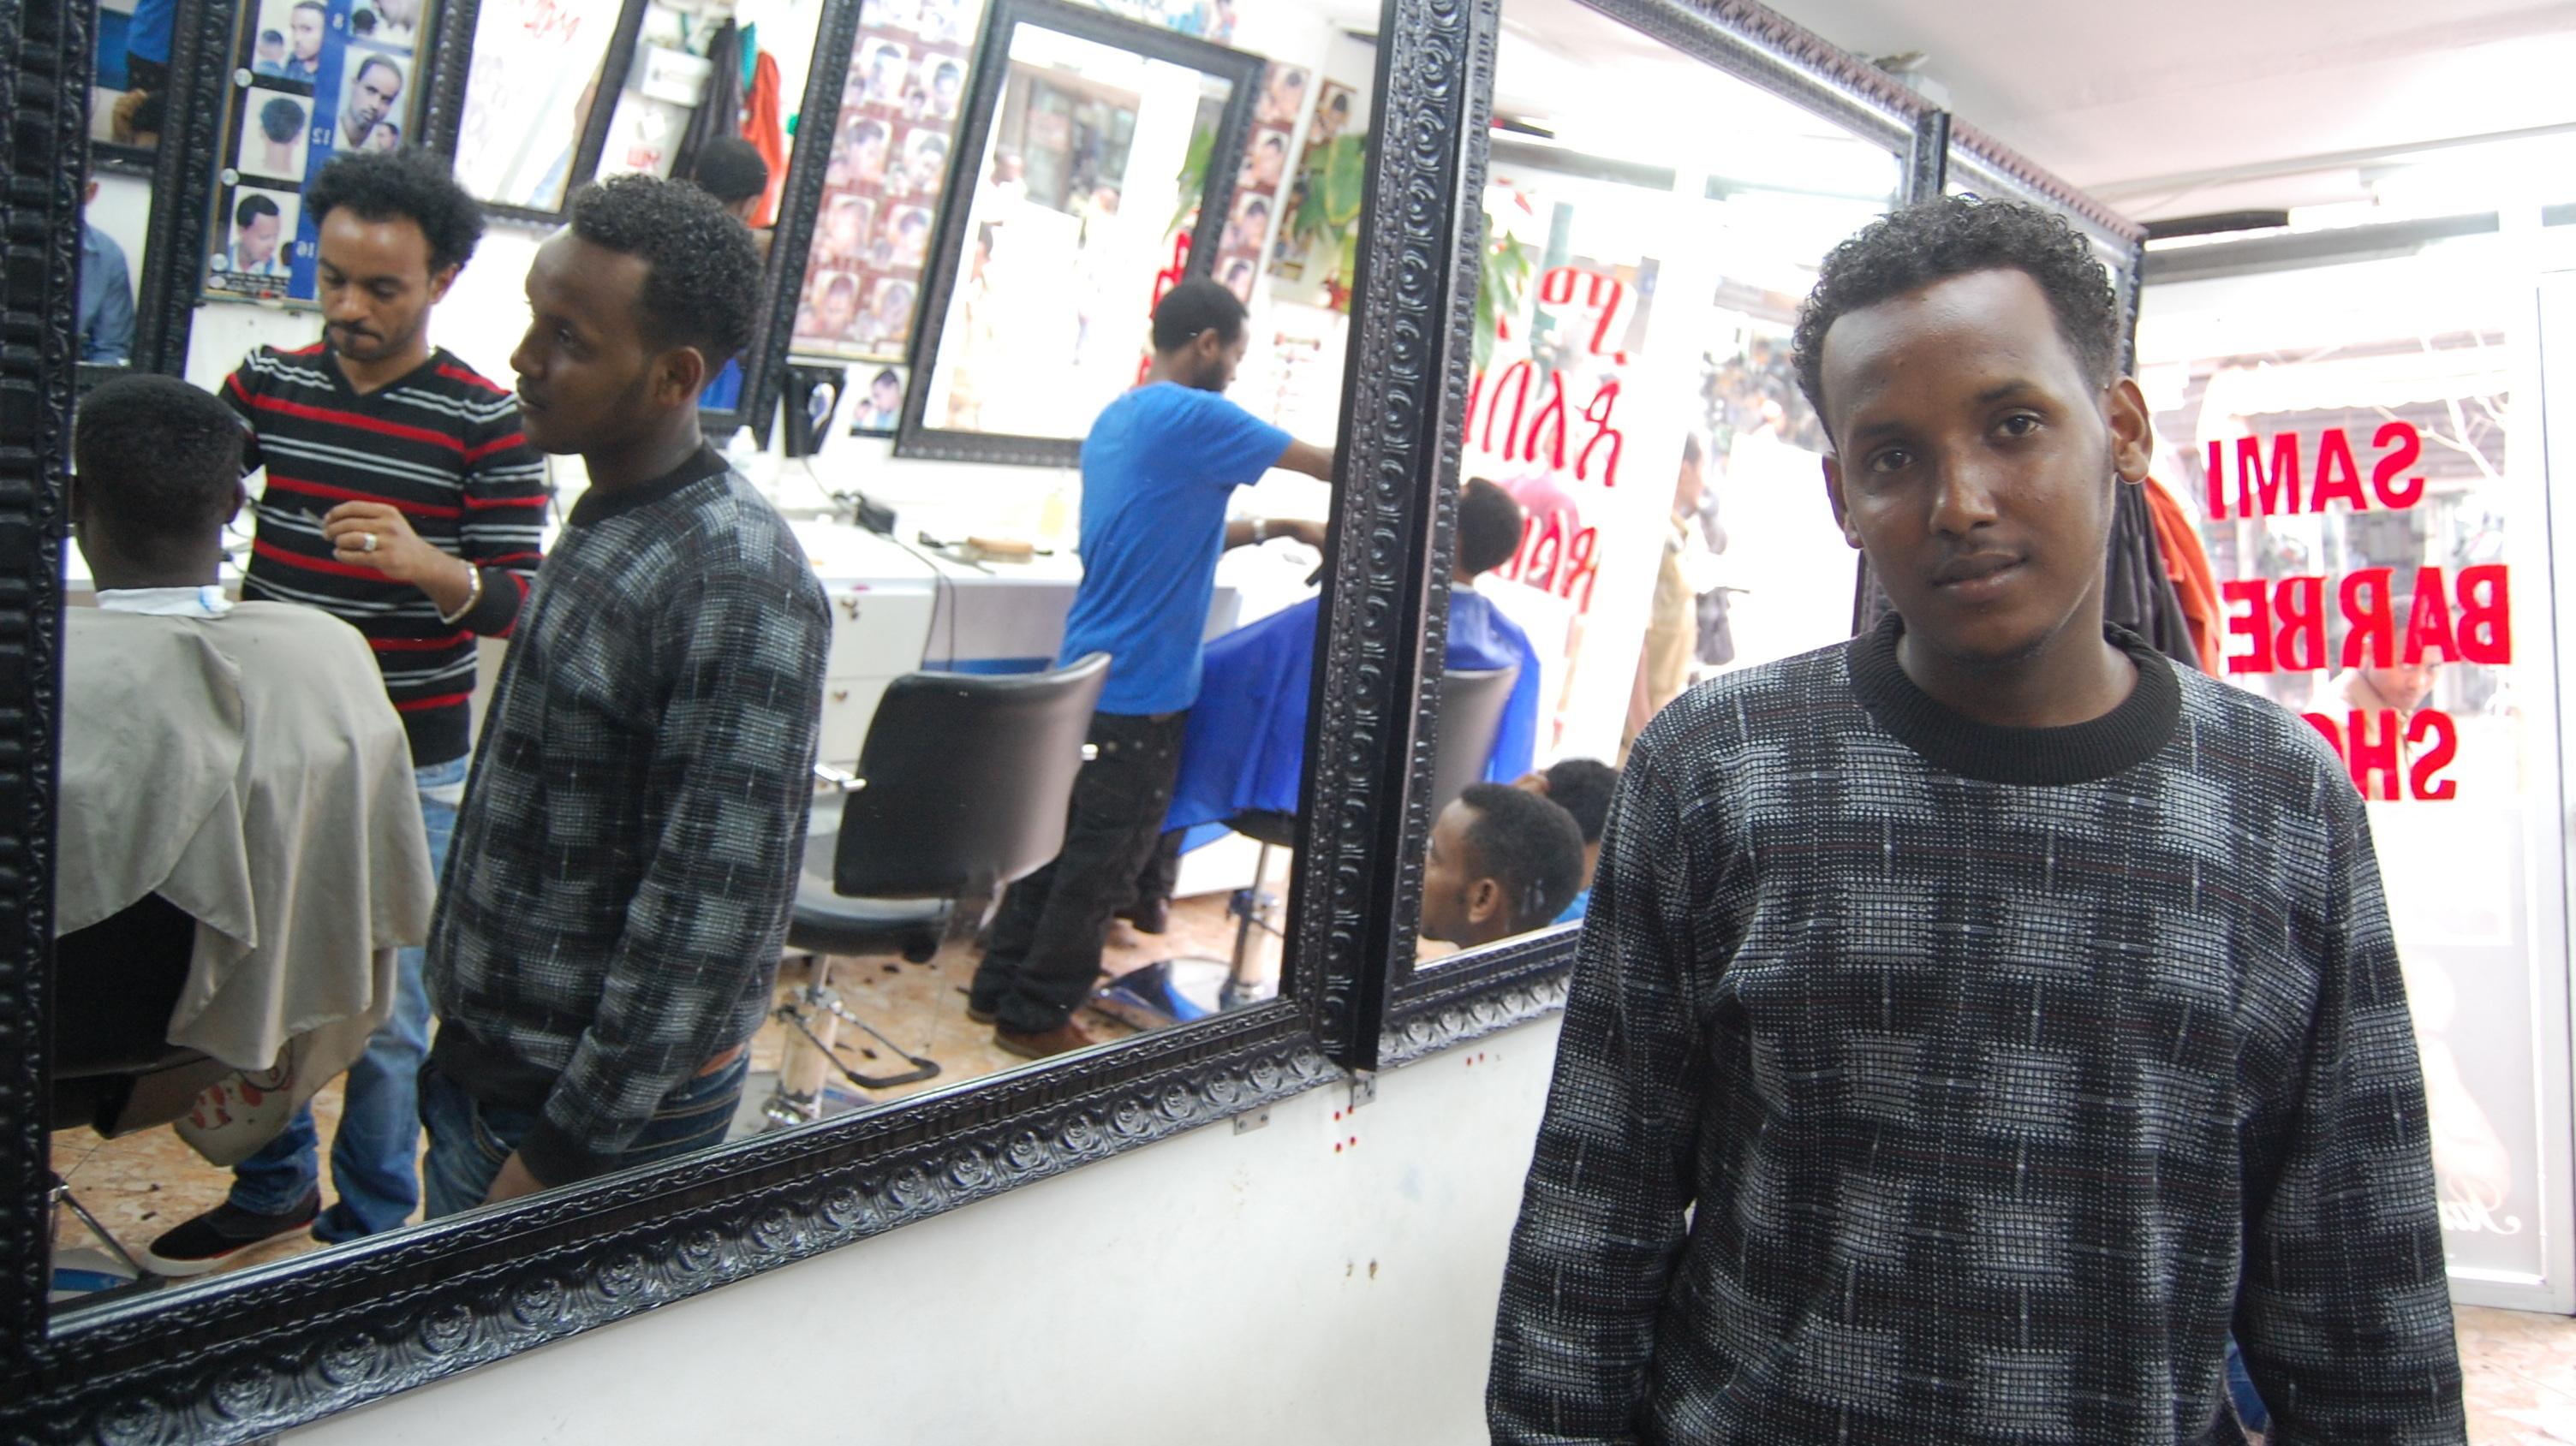 African Migrants Find An Uneasy Asylum In Israel